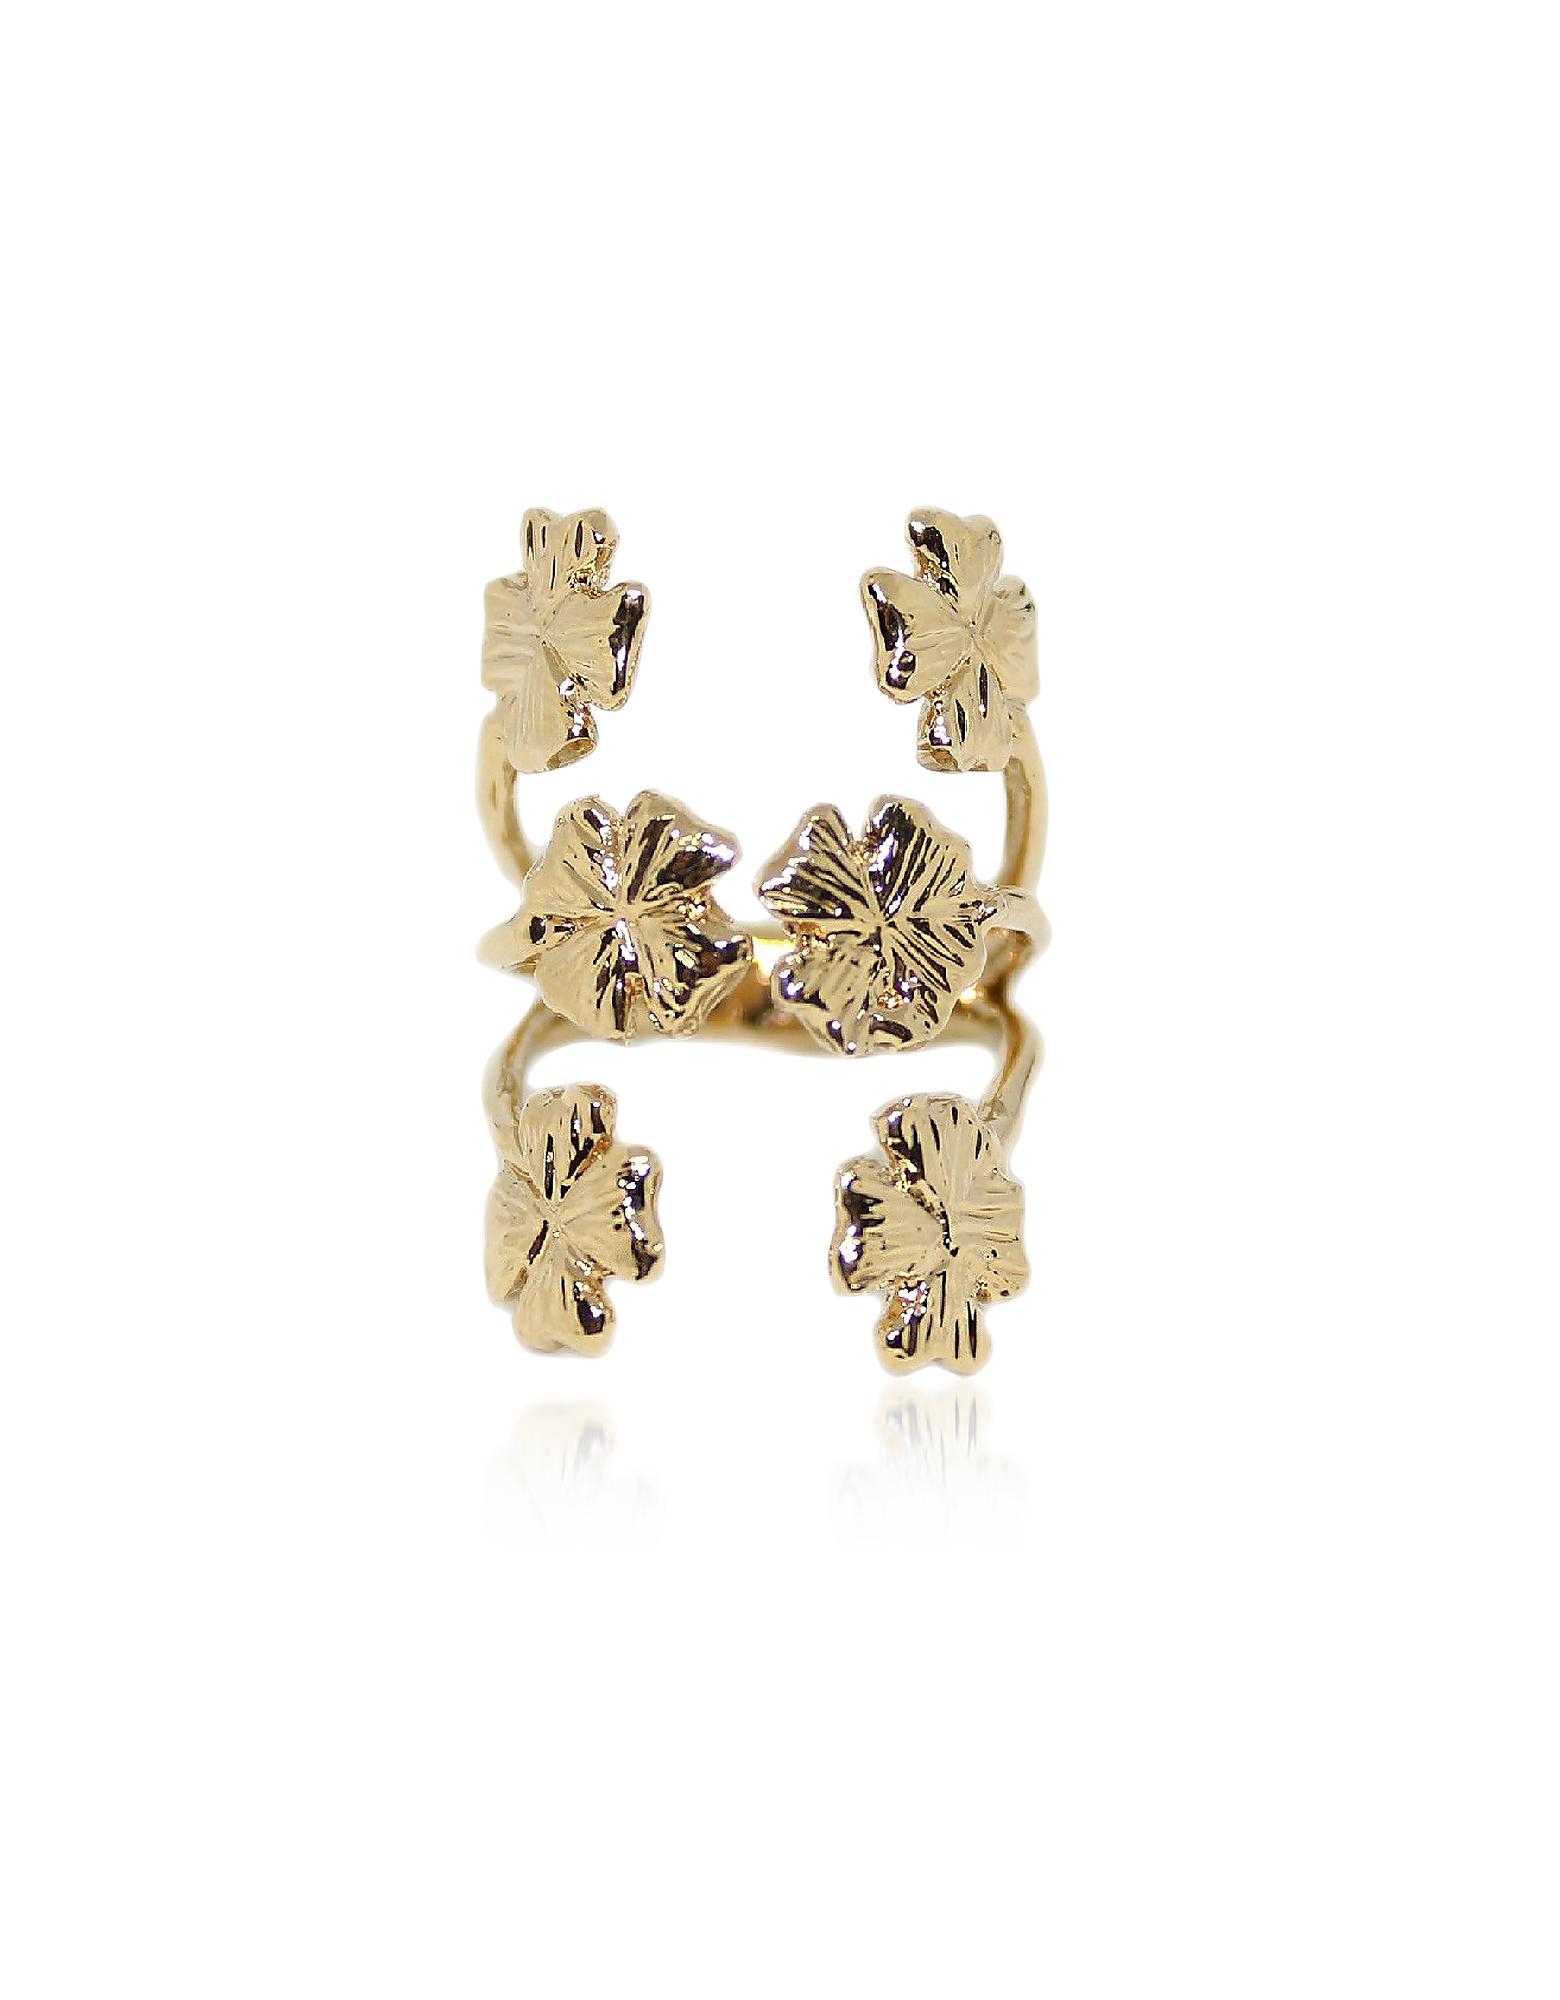 Bronze Ring w/ Six Four-Leaf Clovers